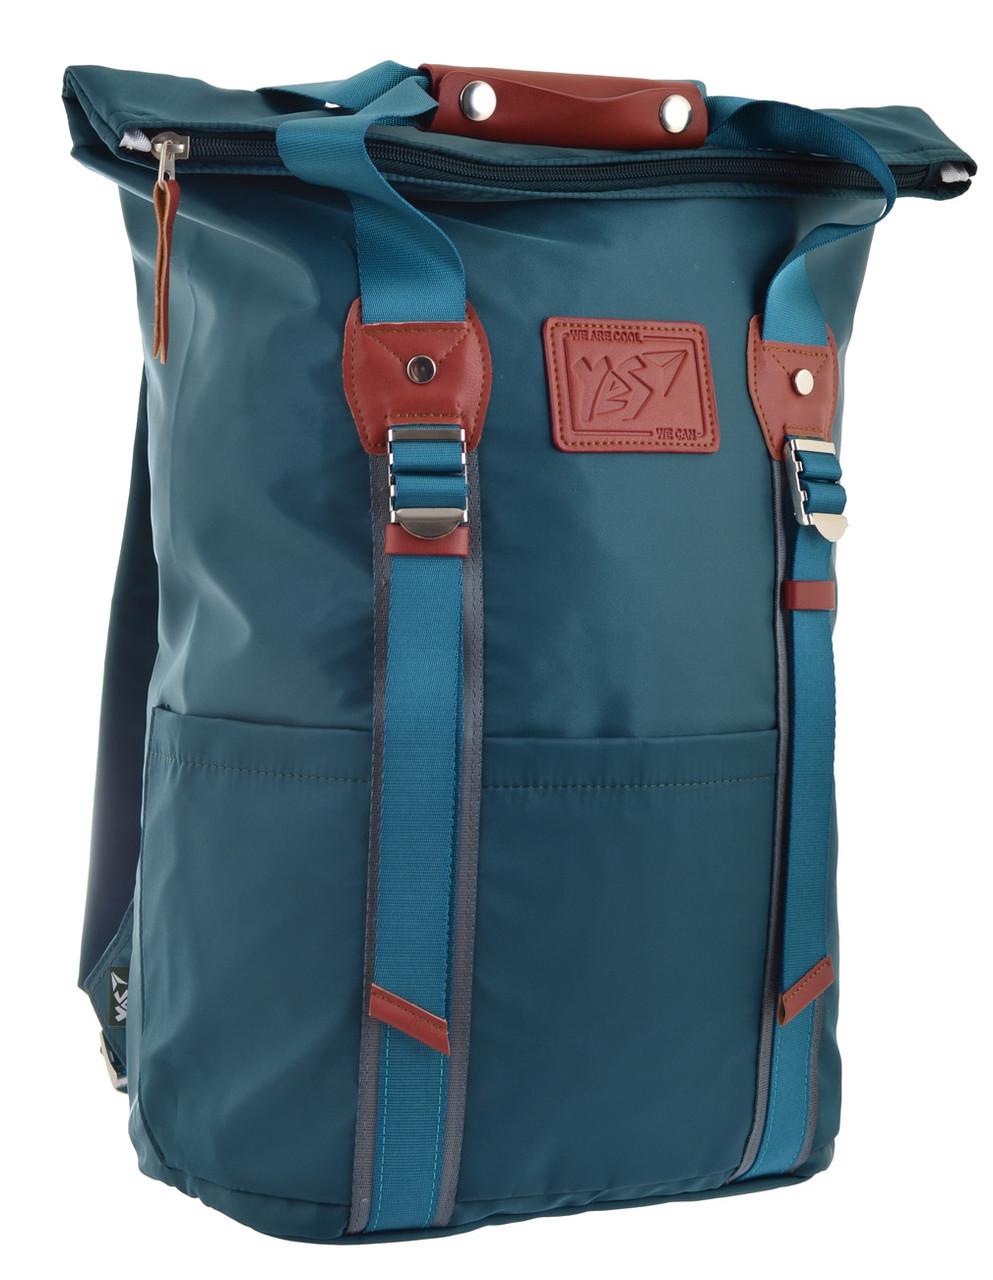 Рюкзак міський YES Roll-top T-58 Emerald 14 л Синій (557257)